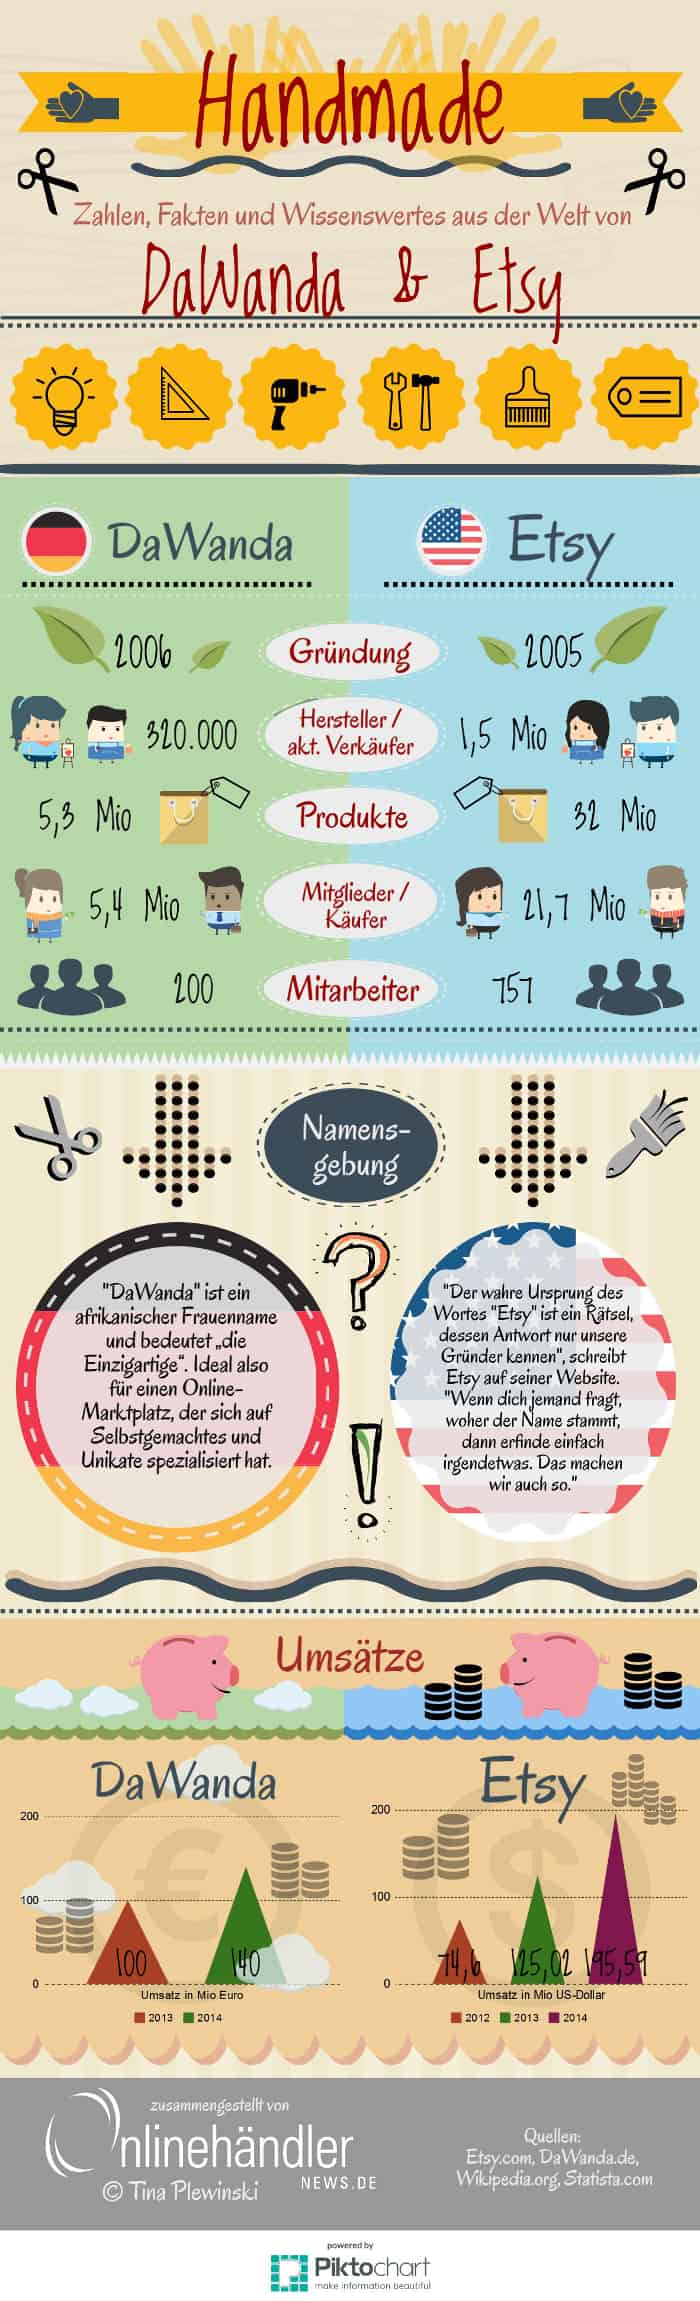 Infografik Handmade: Etsy und DaWanda